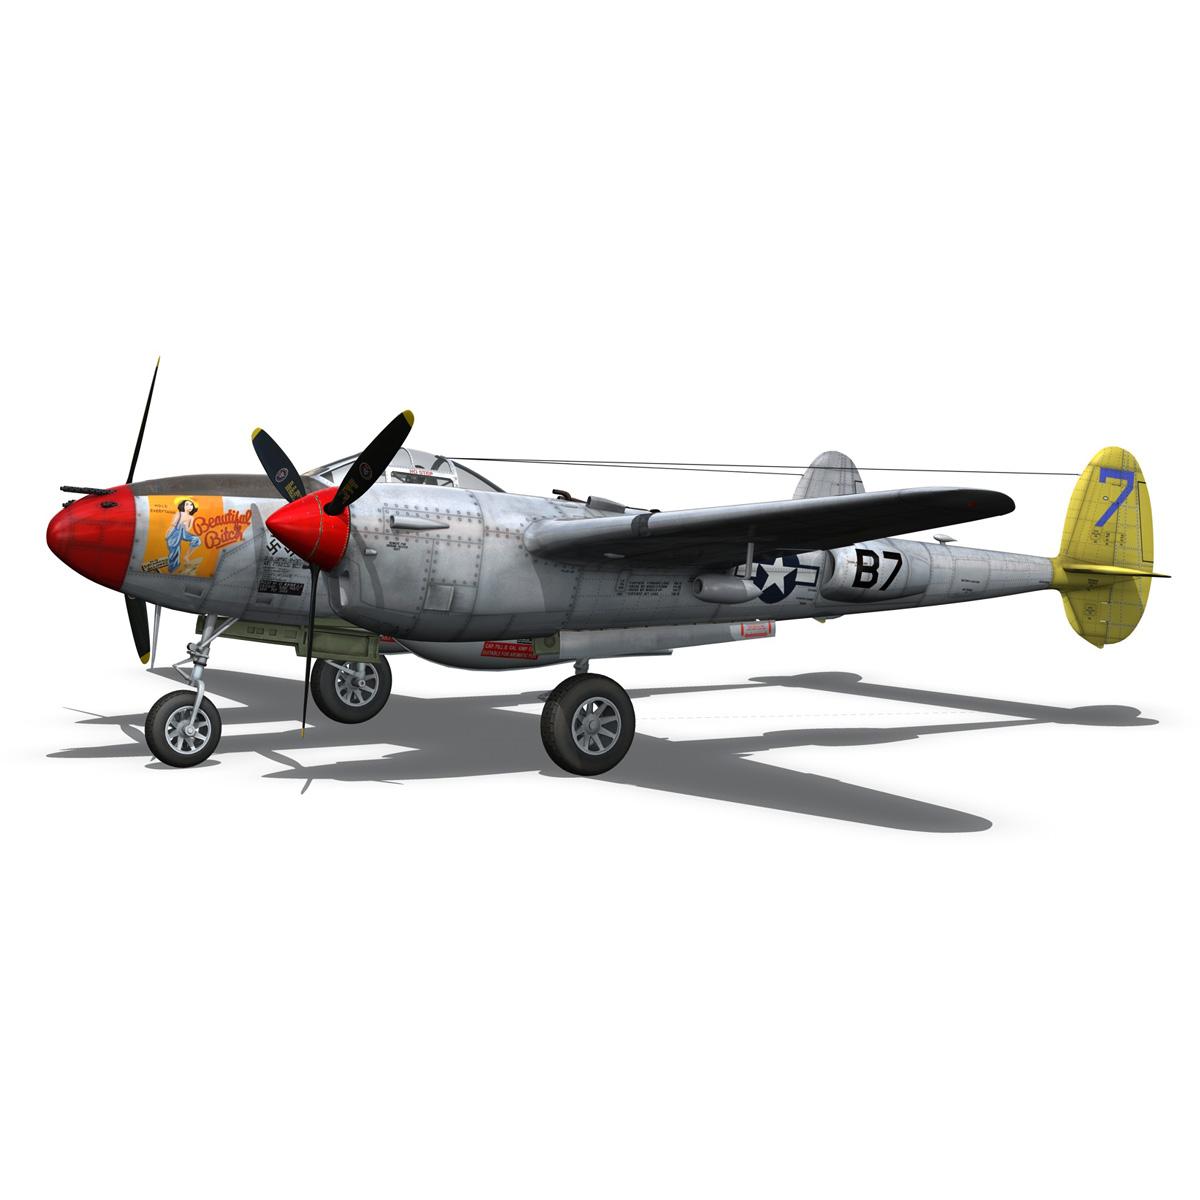 lockheed p-38 lightning – beautiful bitch 3d model fbx c4d lwo obj 272671